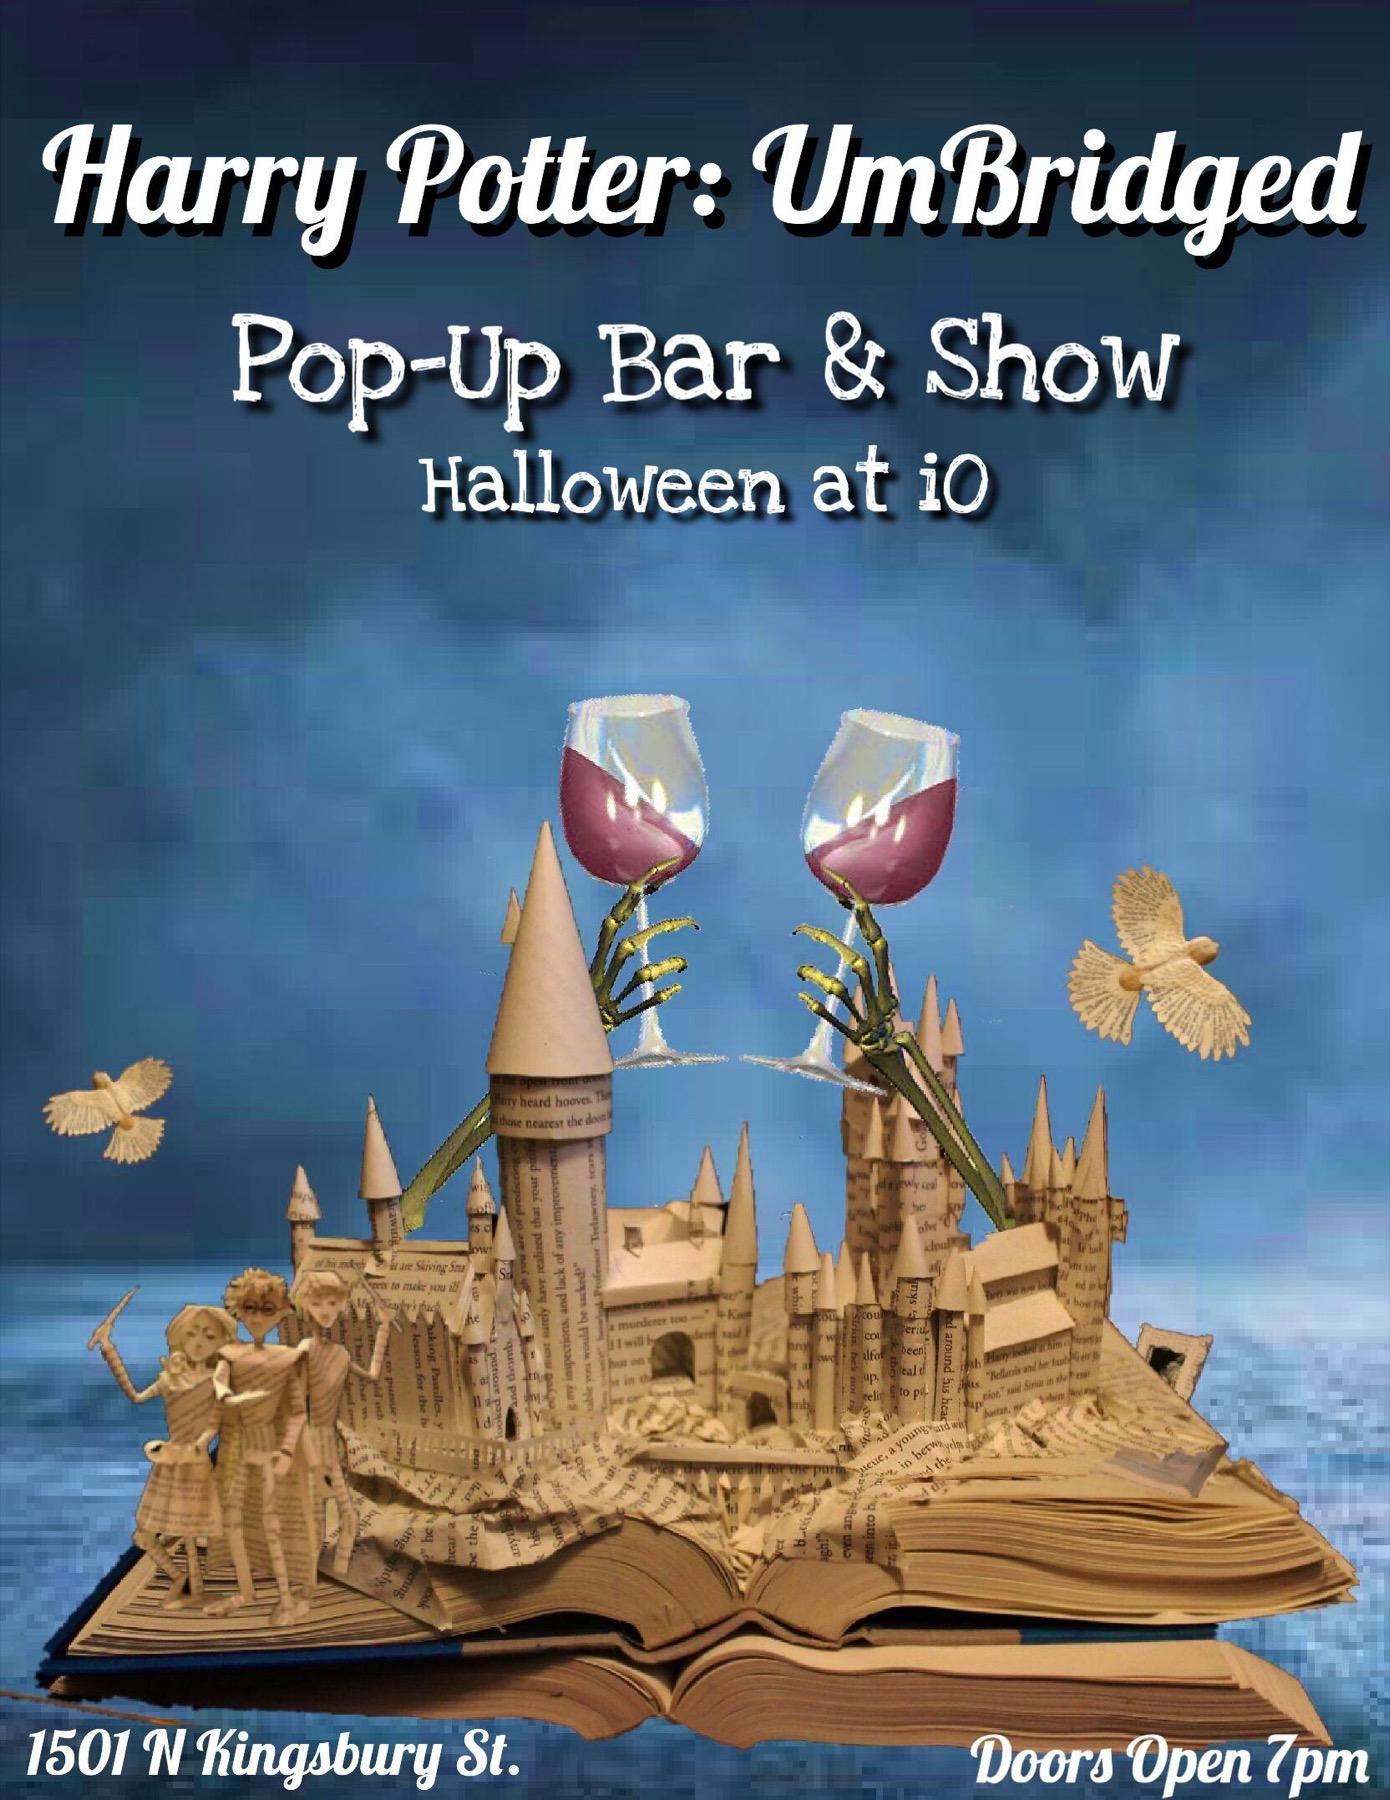 Harry Potter: UMbridged – A Pop-Up Bar & Show